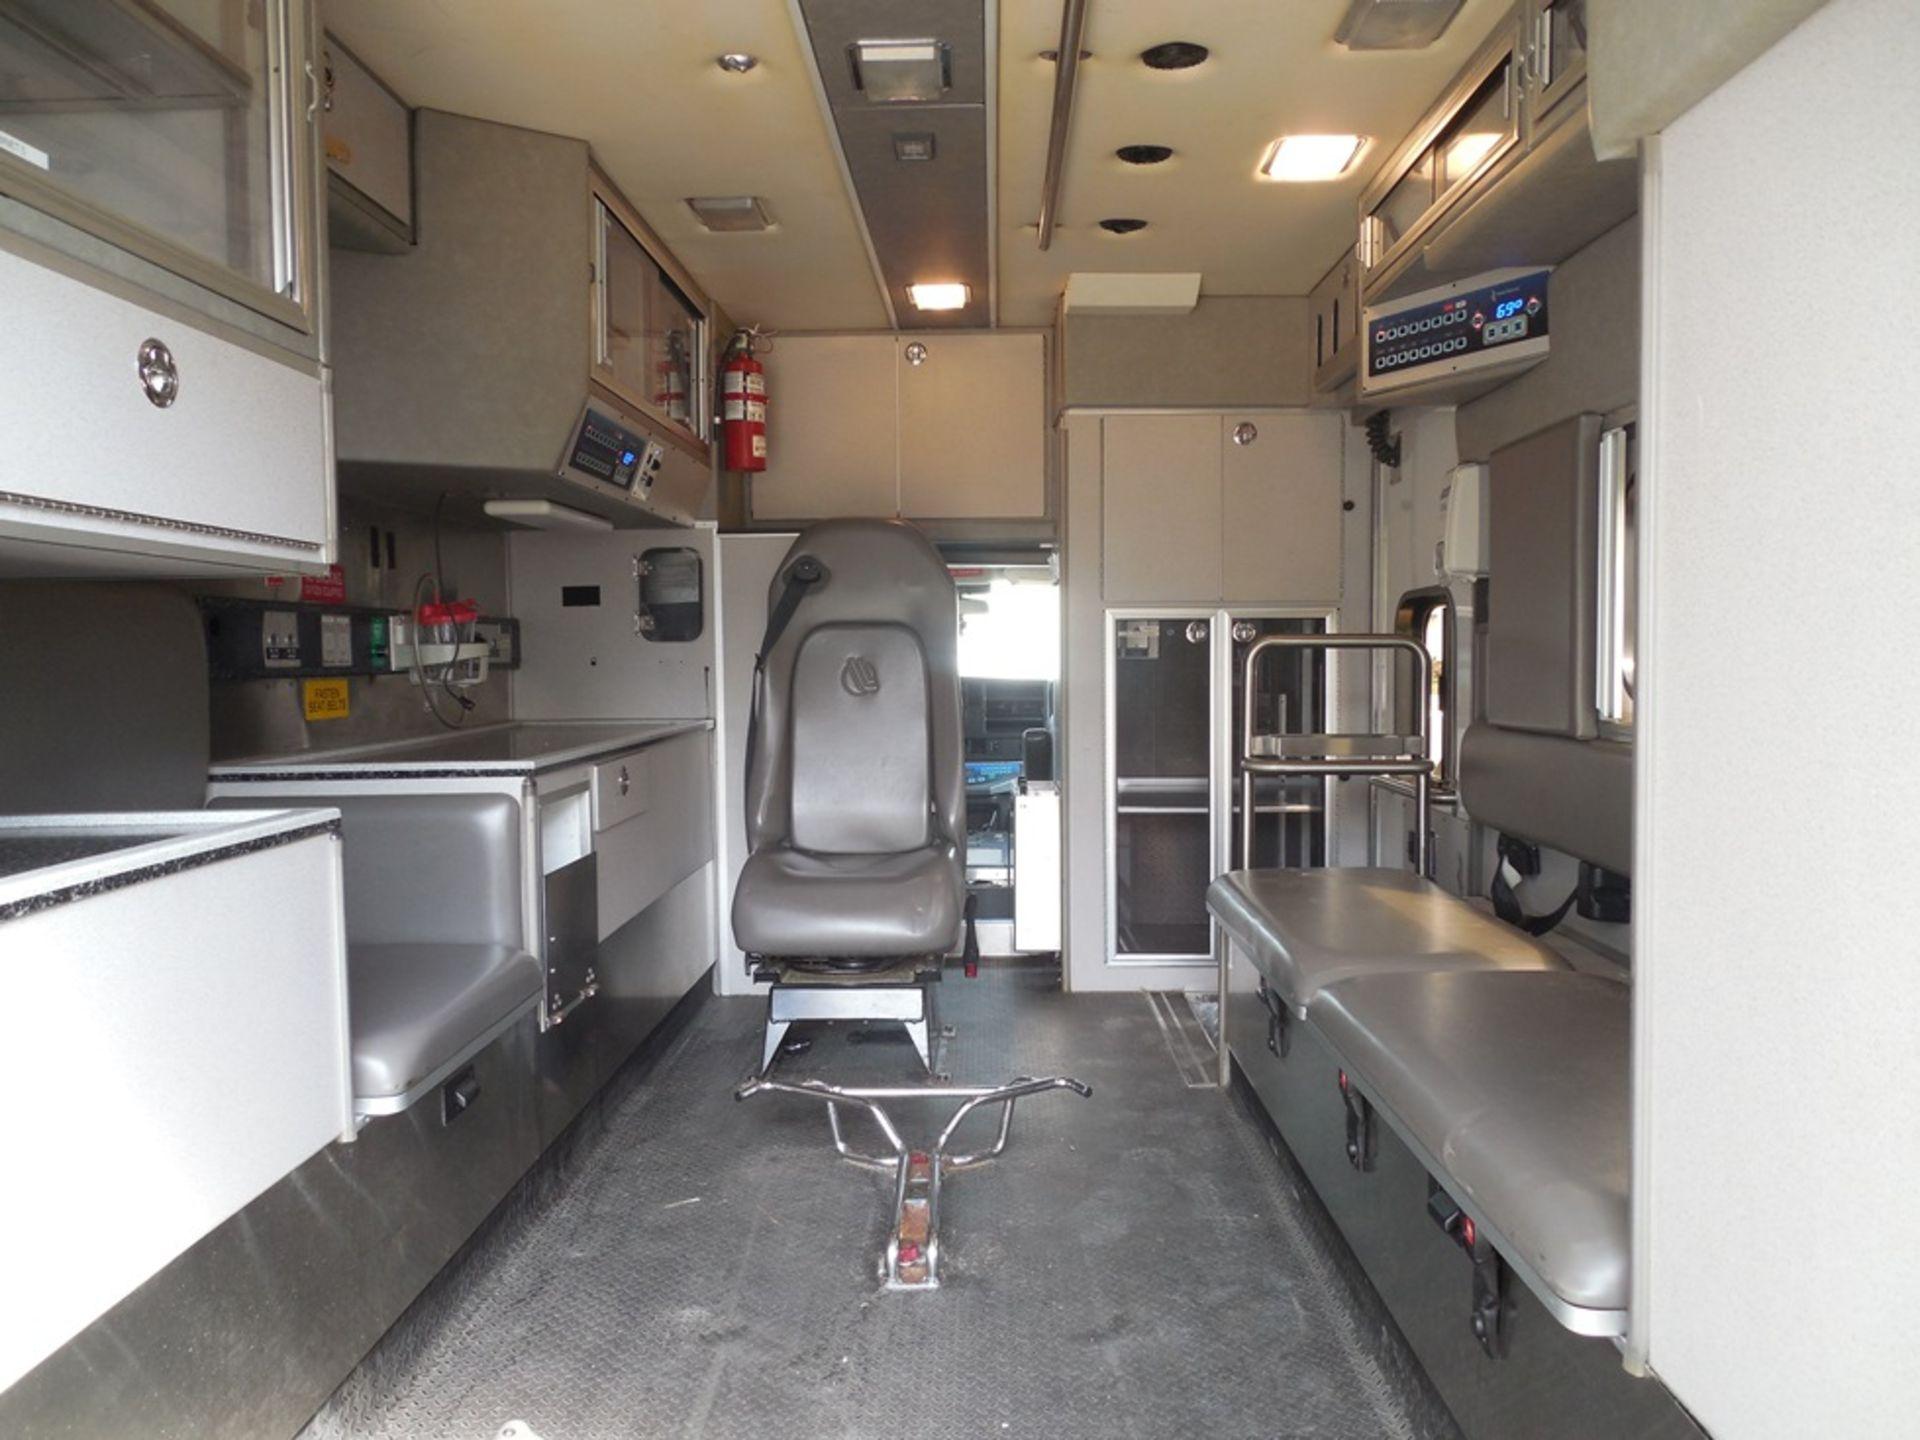 2009 Chev 4500 dsl, box ambulance 226,356 miles vin# 1GBKG316191158061 - Image 6 of 6